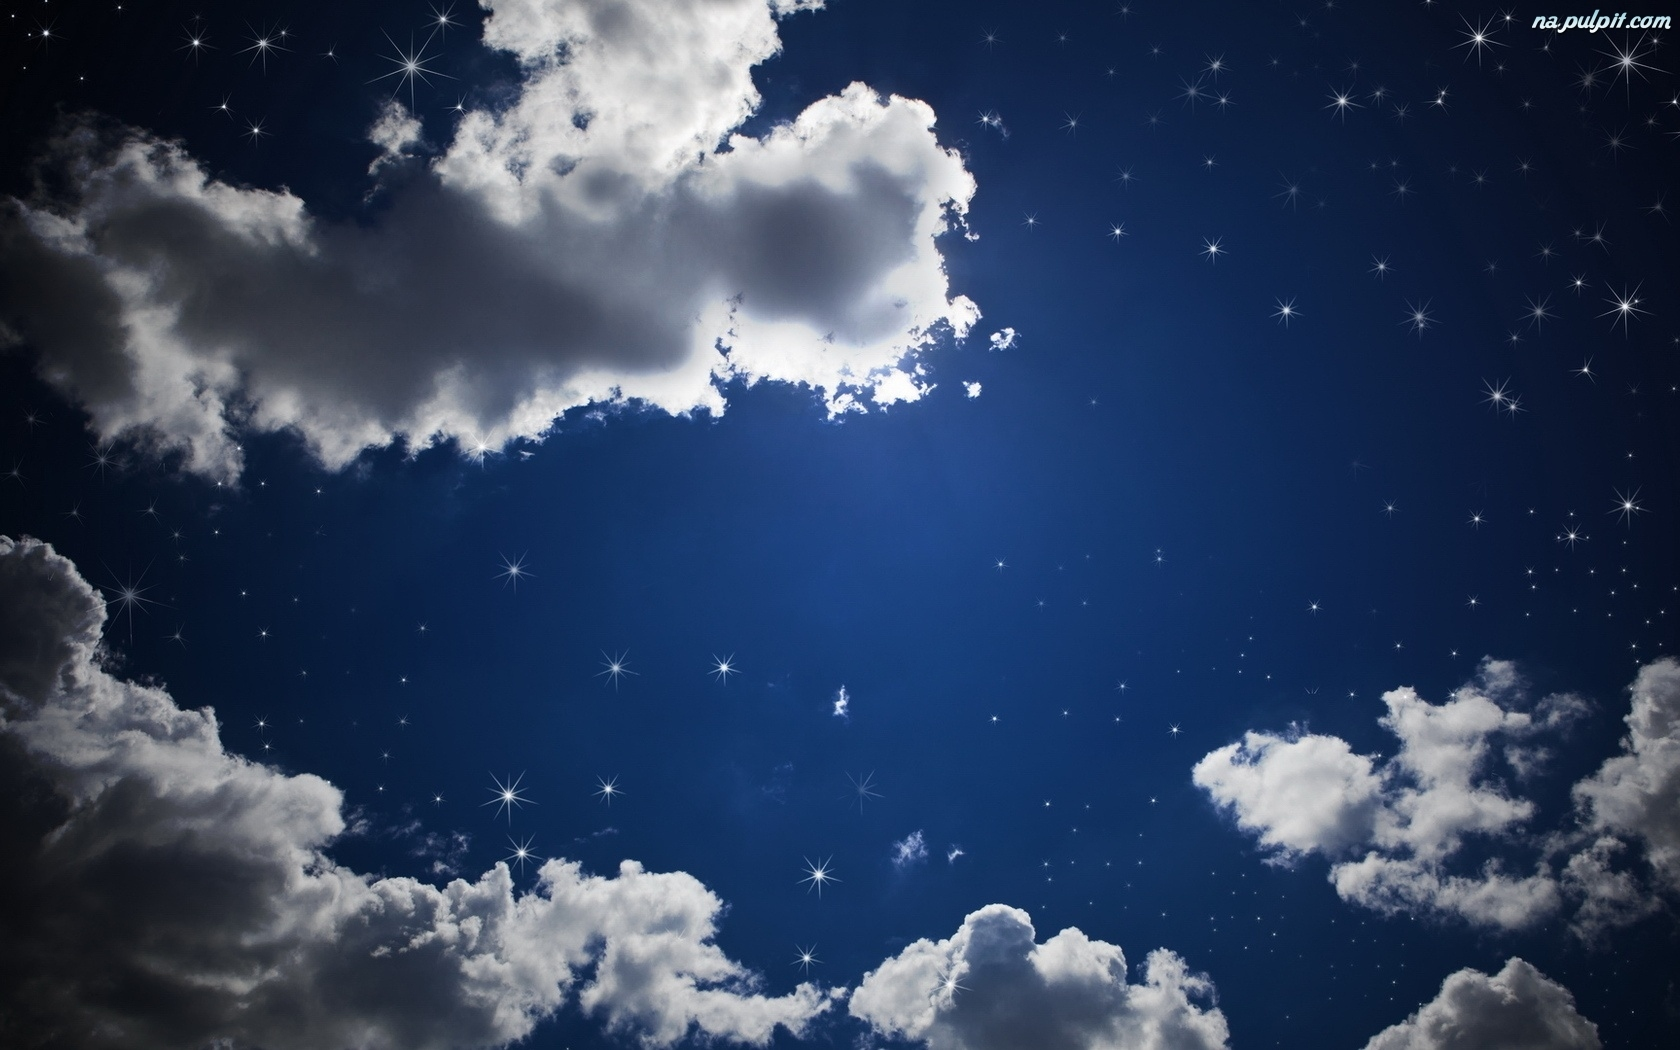 Night Moon Romance Love Stars Sky Clouds Wallpaper: Gwiazdy, Chmury, Niebo Na Pulpit